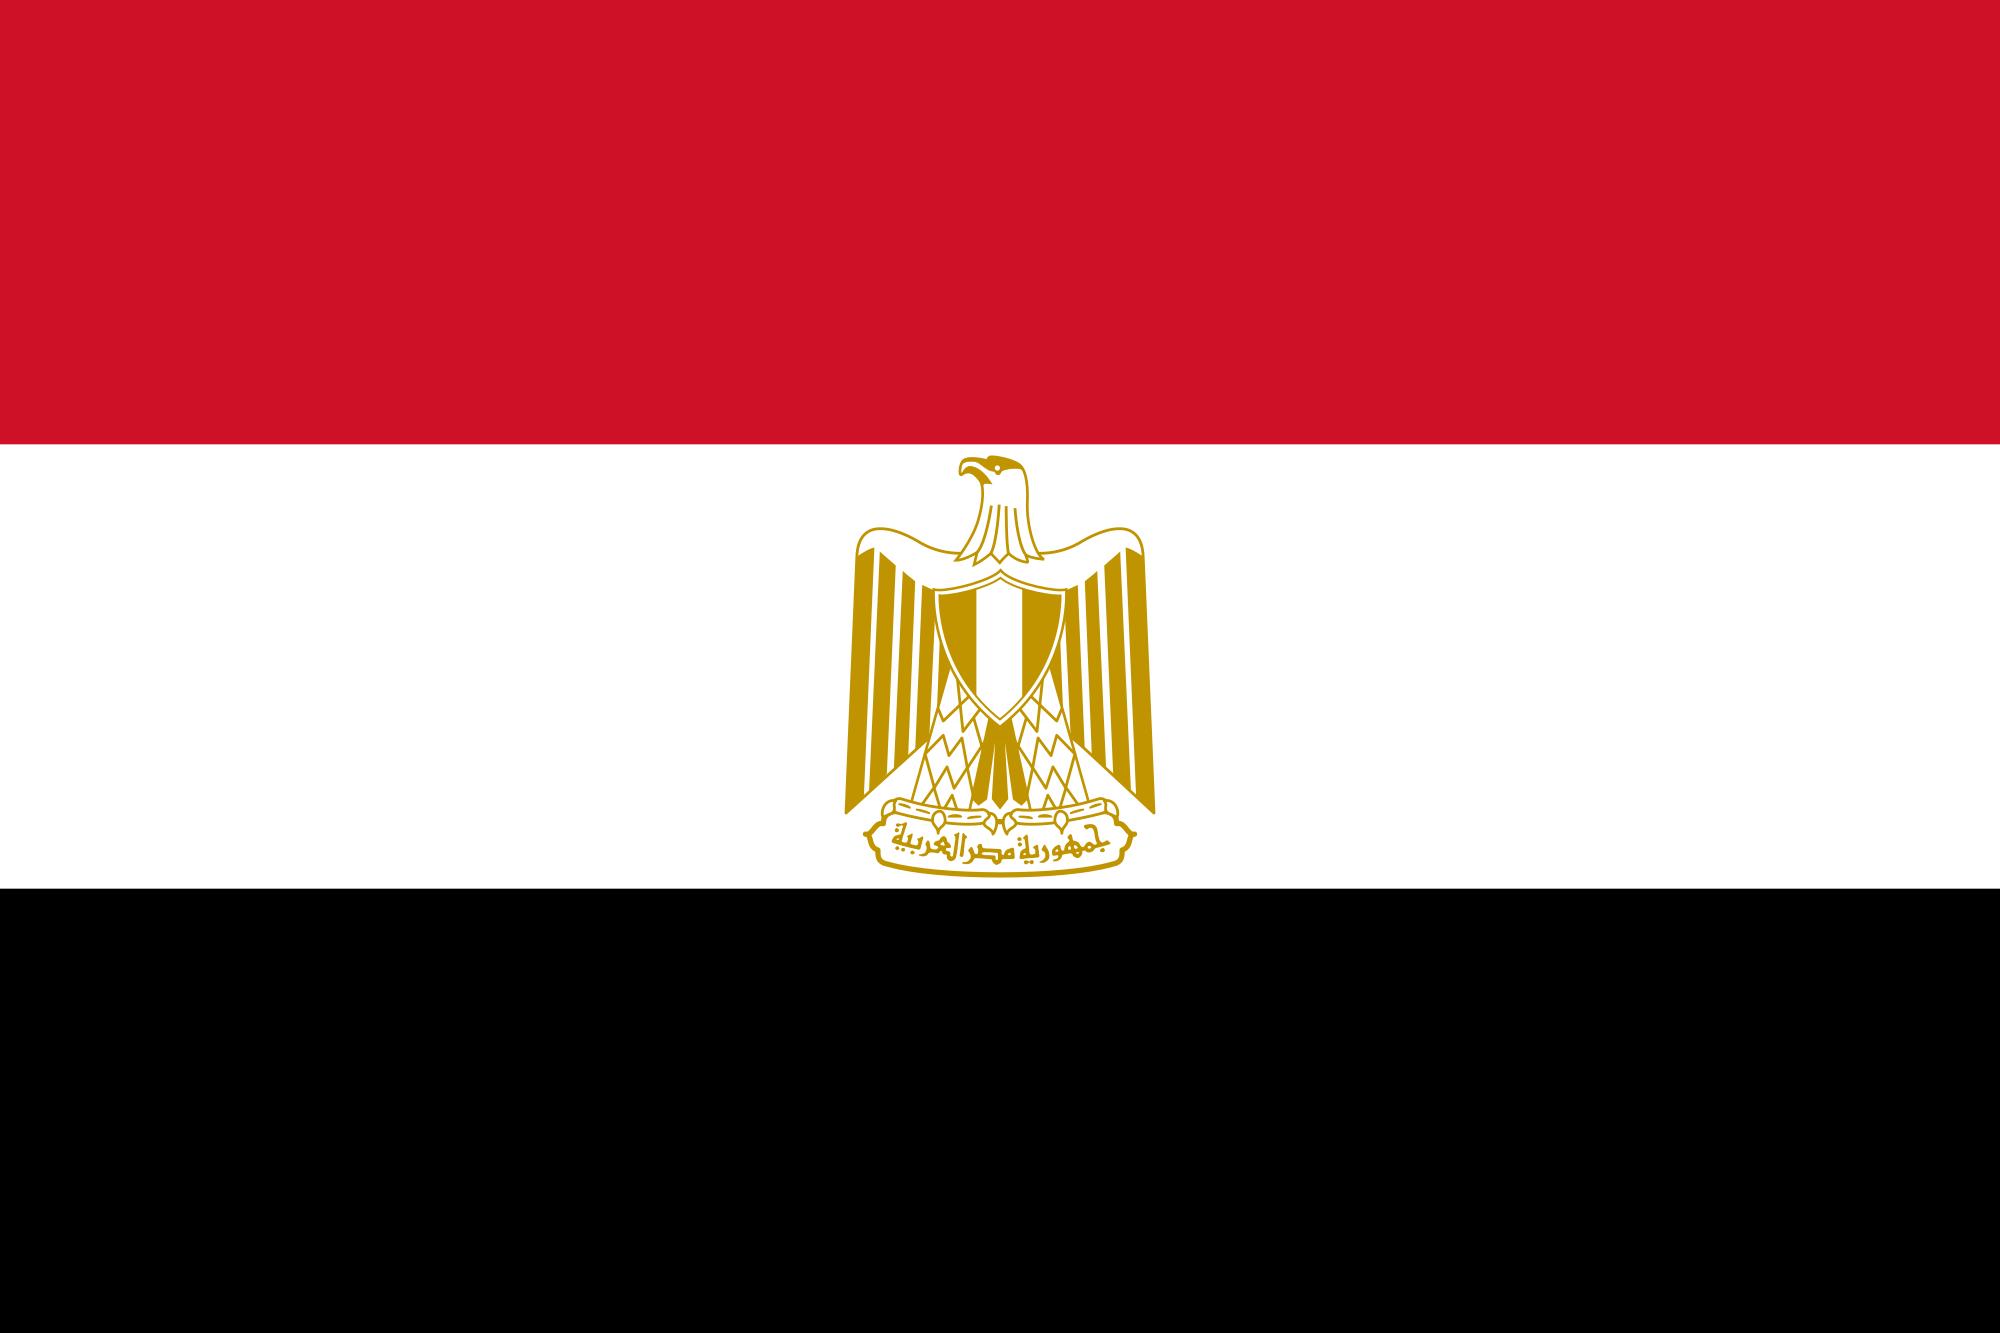 صور علم مصر (2)